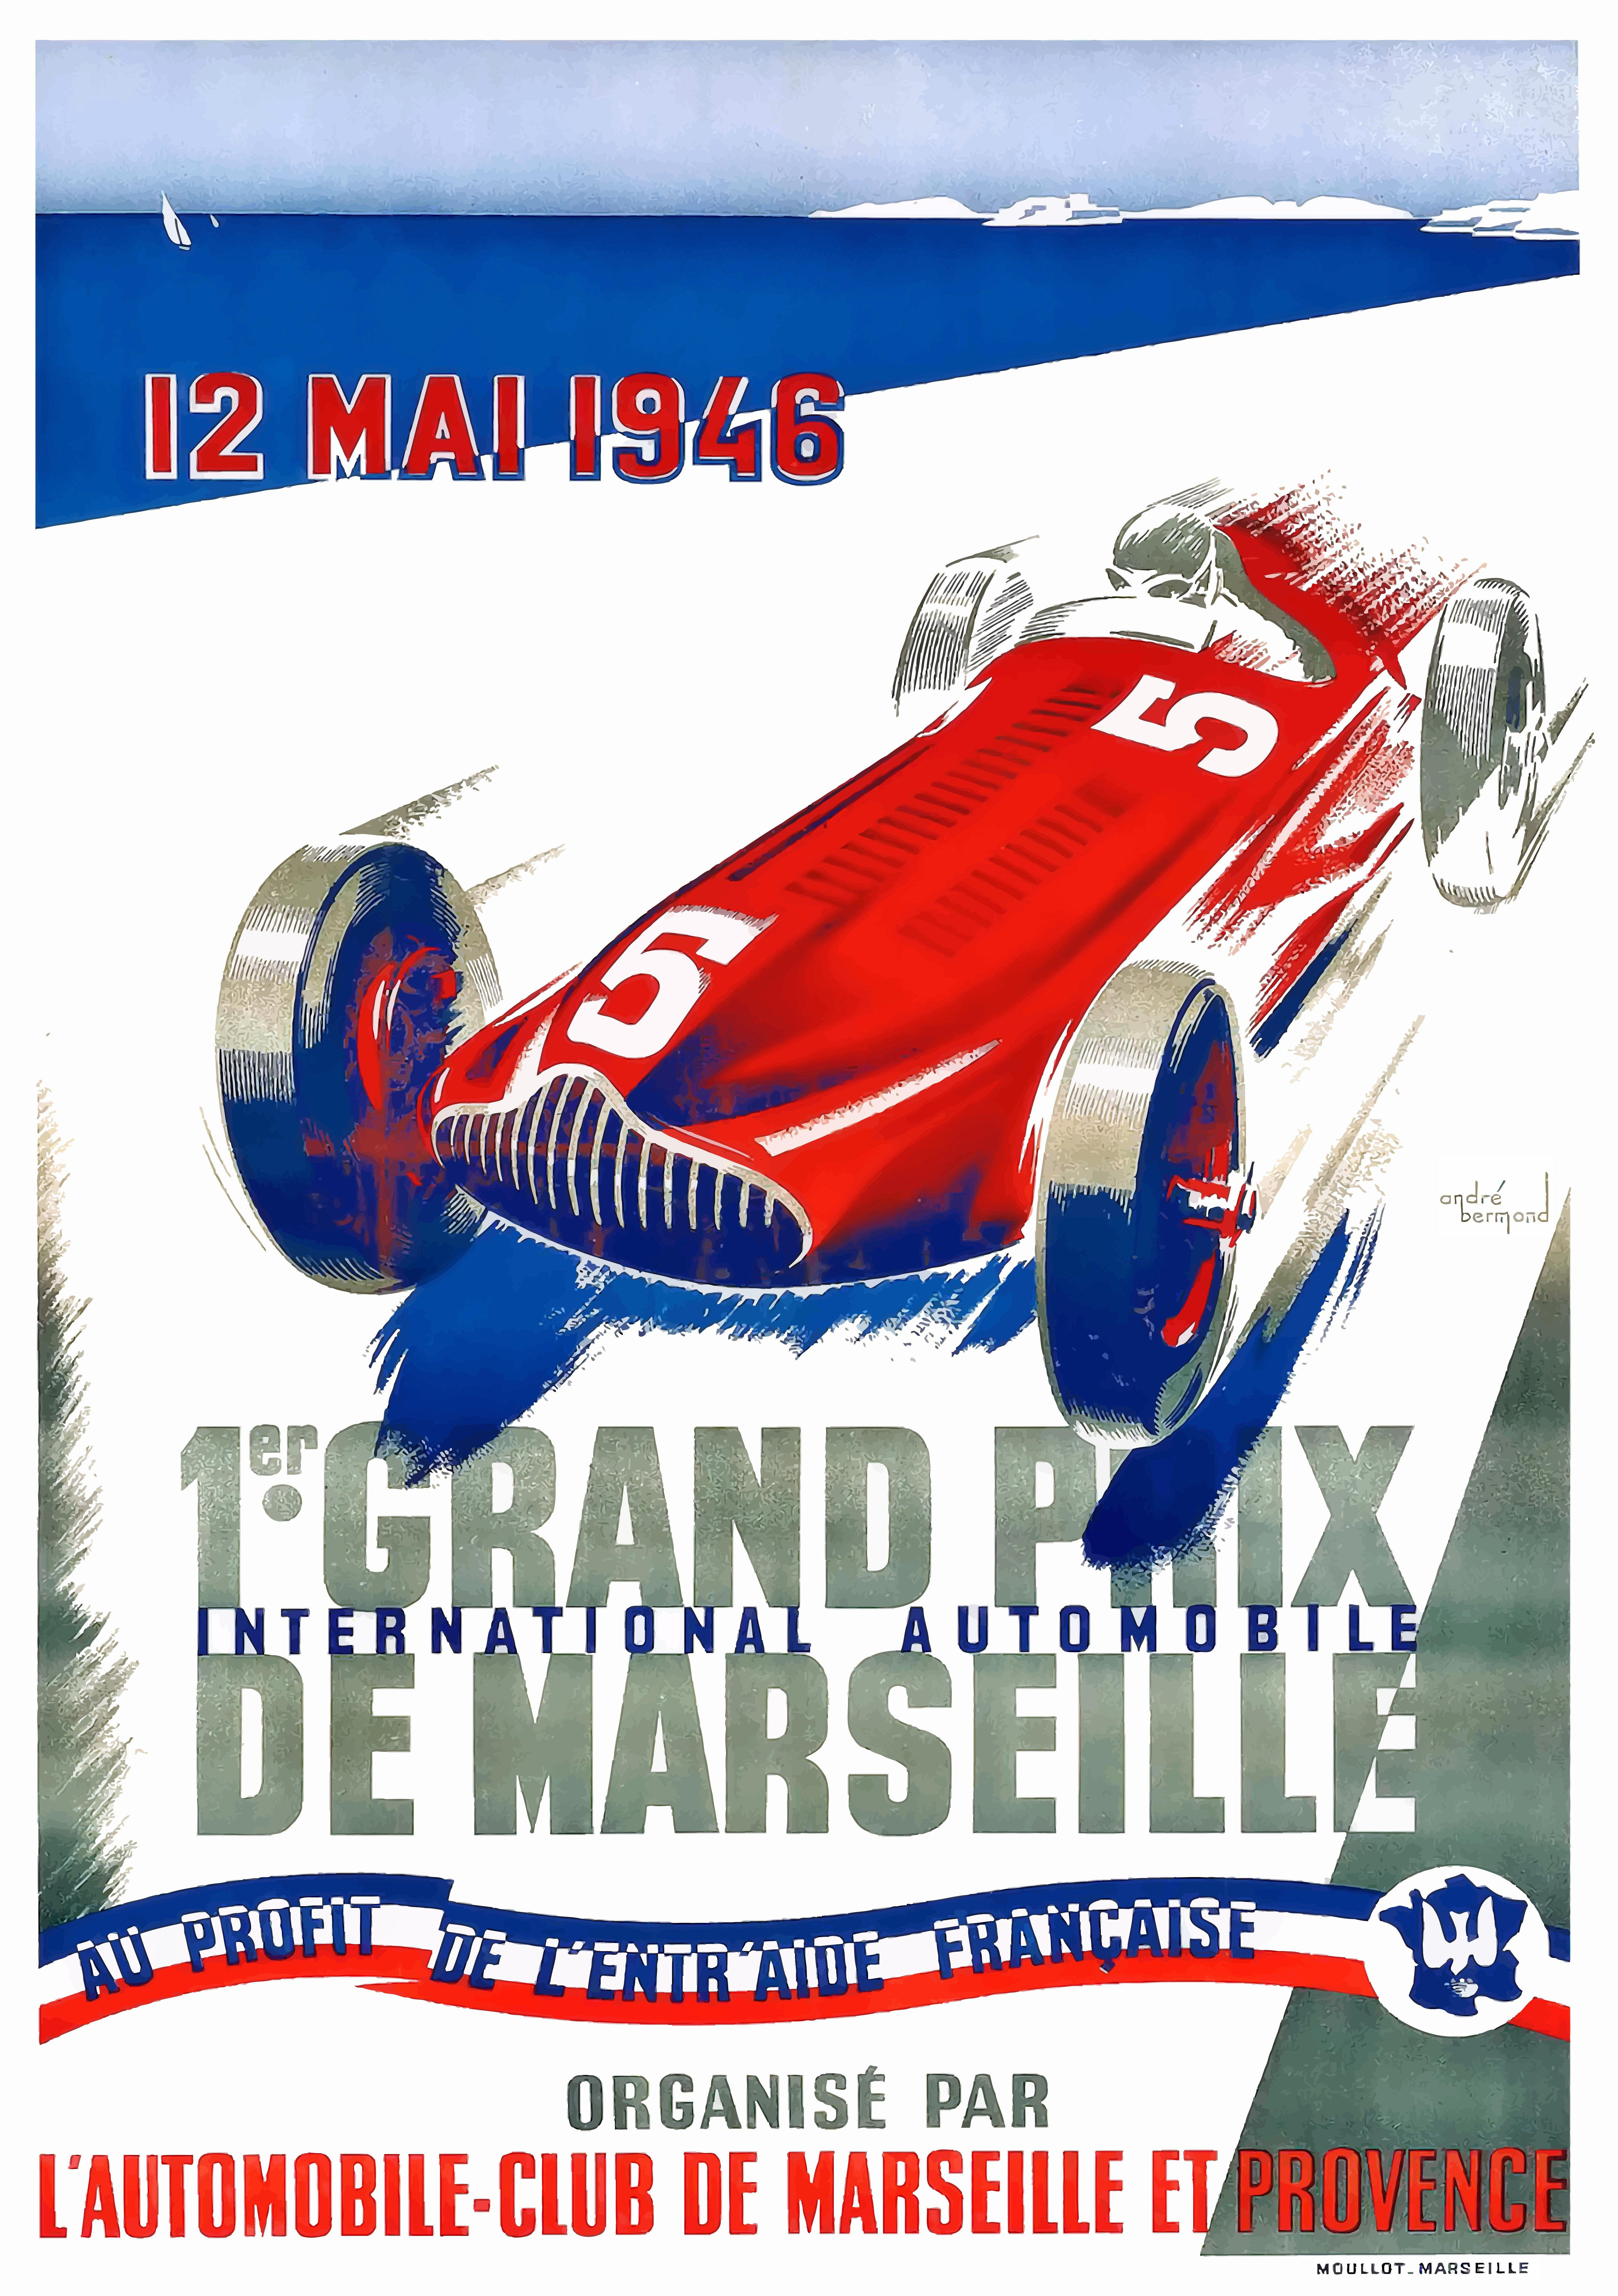 1946 Marseille Grand Prix Racing Poster In 2021 Racing Posters Vintage Racing Poster Grand Prix Posters